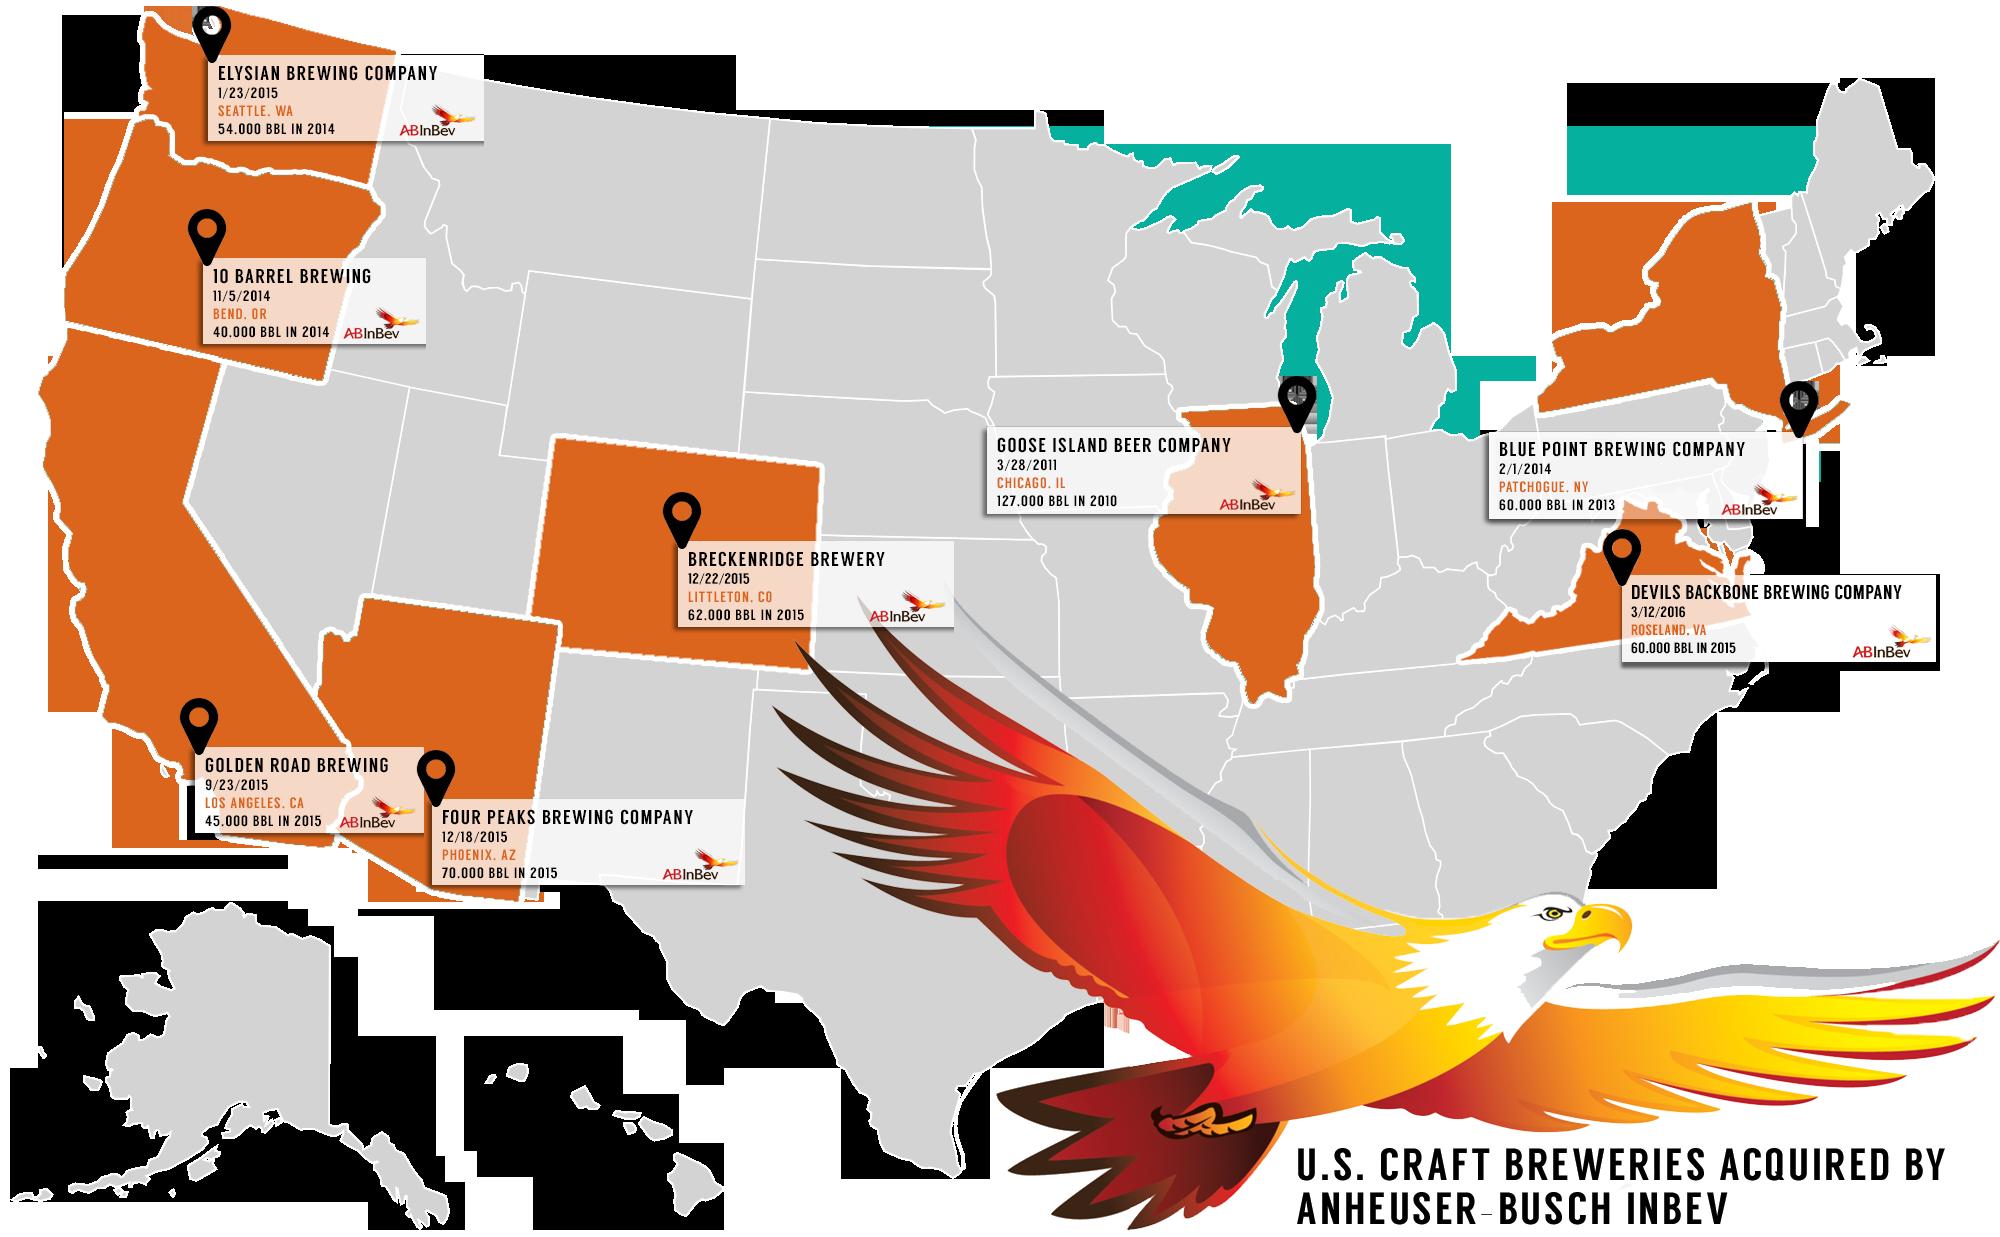 Anheuser-Busch Craft Breweries Owned